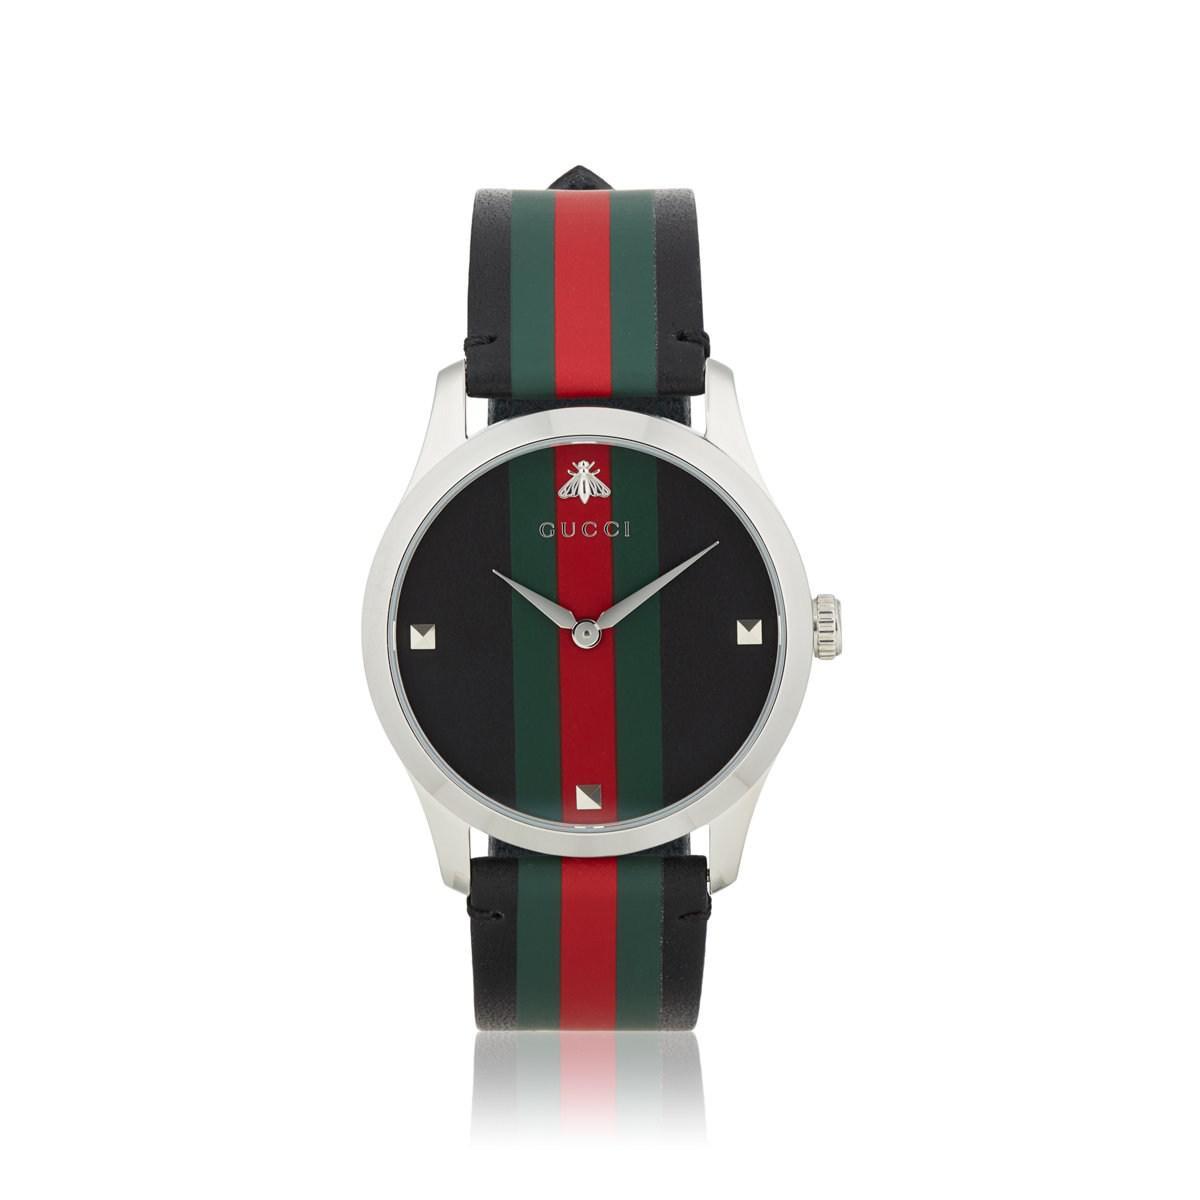 ddd7d472b2e Gucci - Black G-timeless Watch for Men - Lyst. View fullscreen